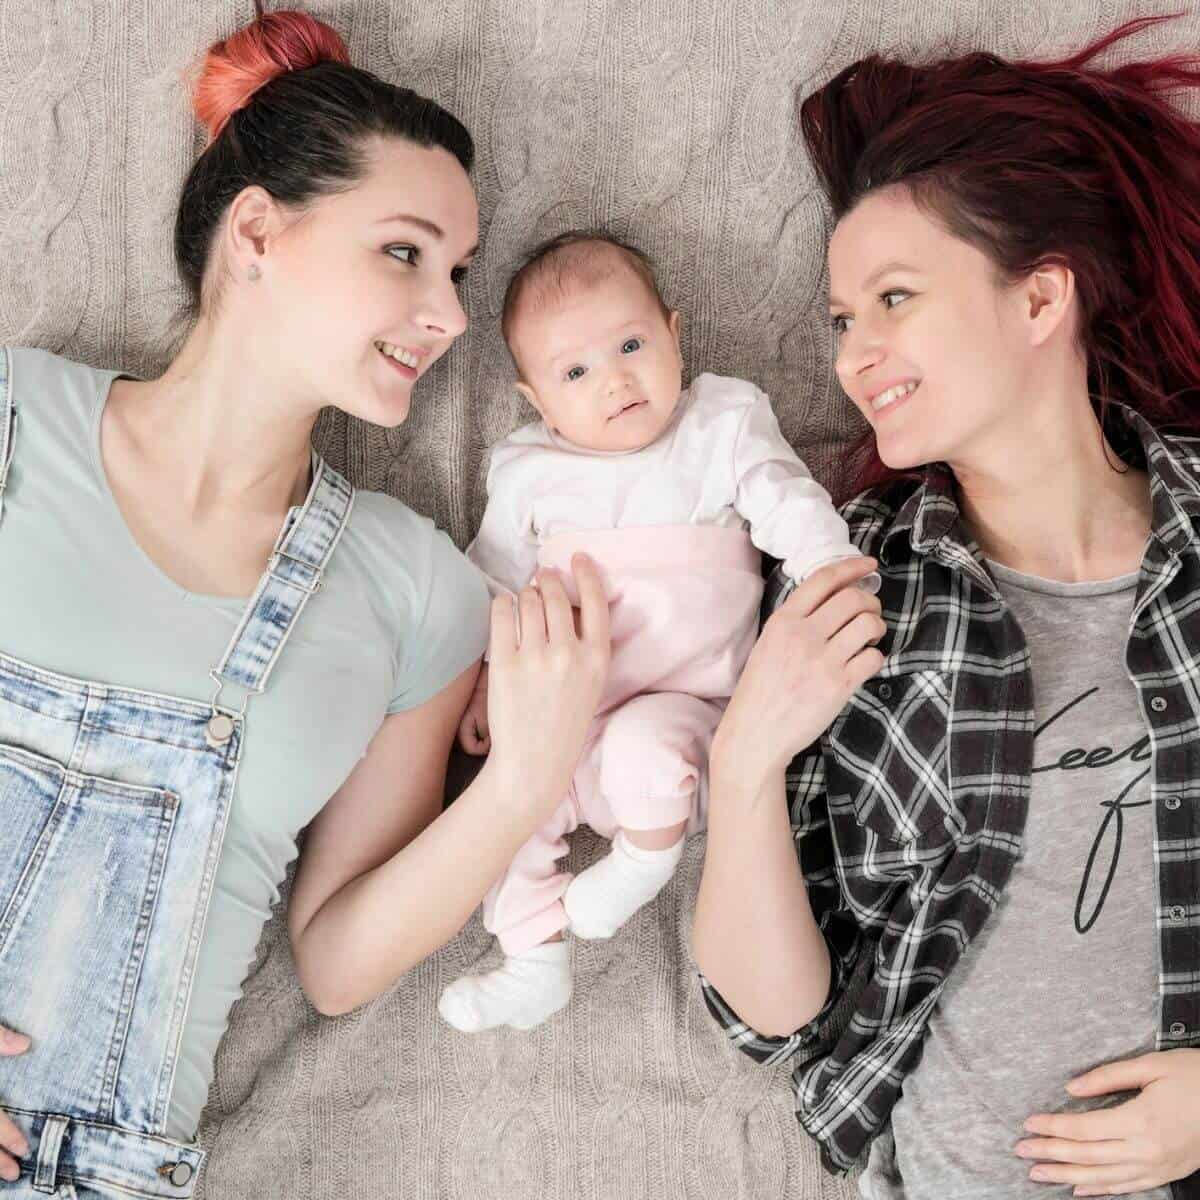 At home insemination lesbian couple